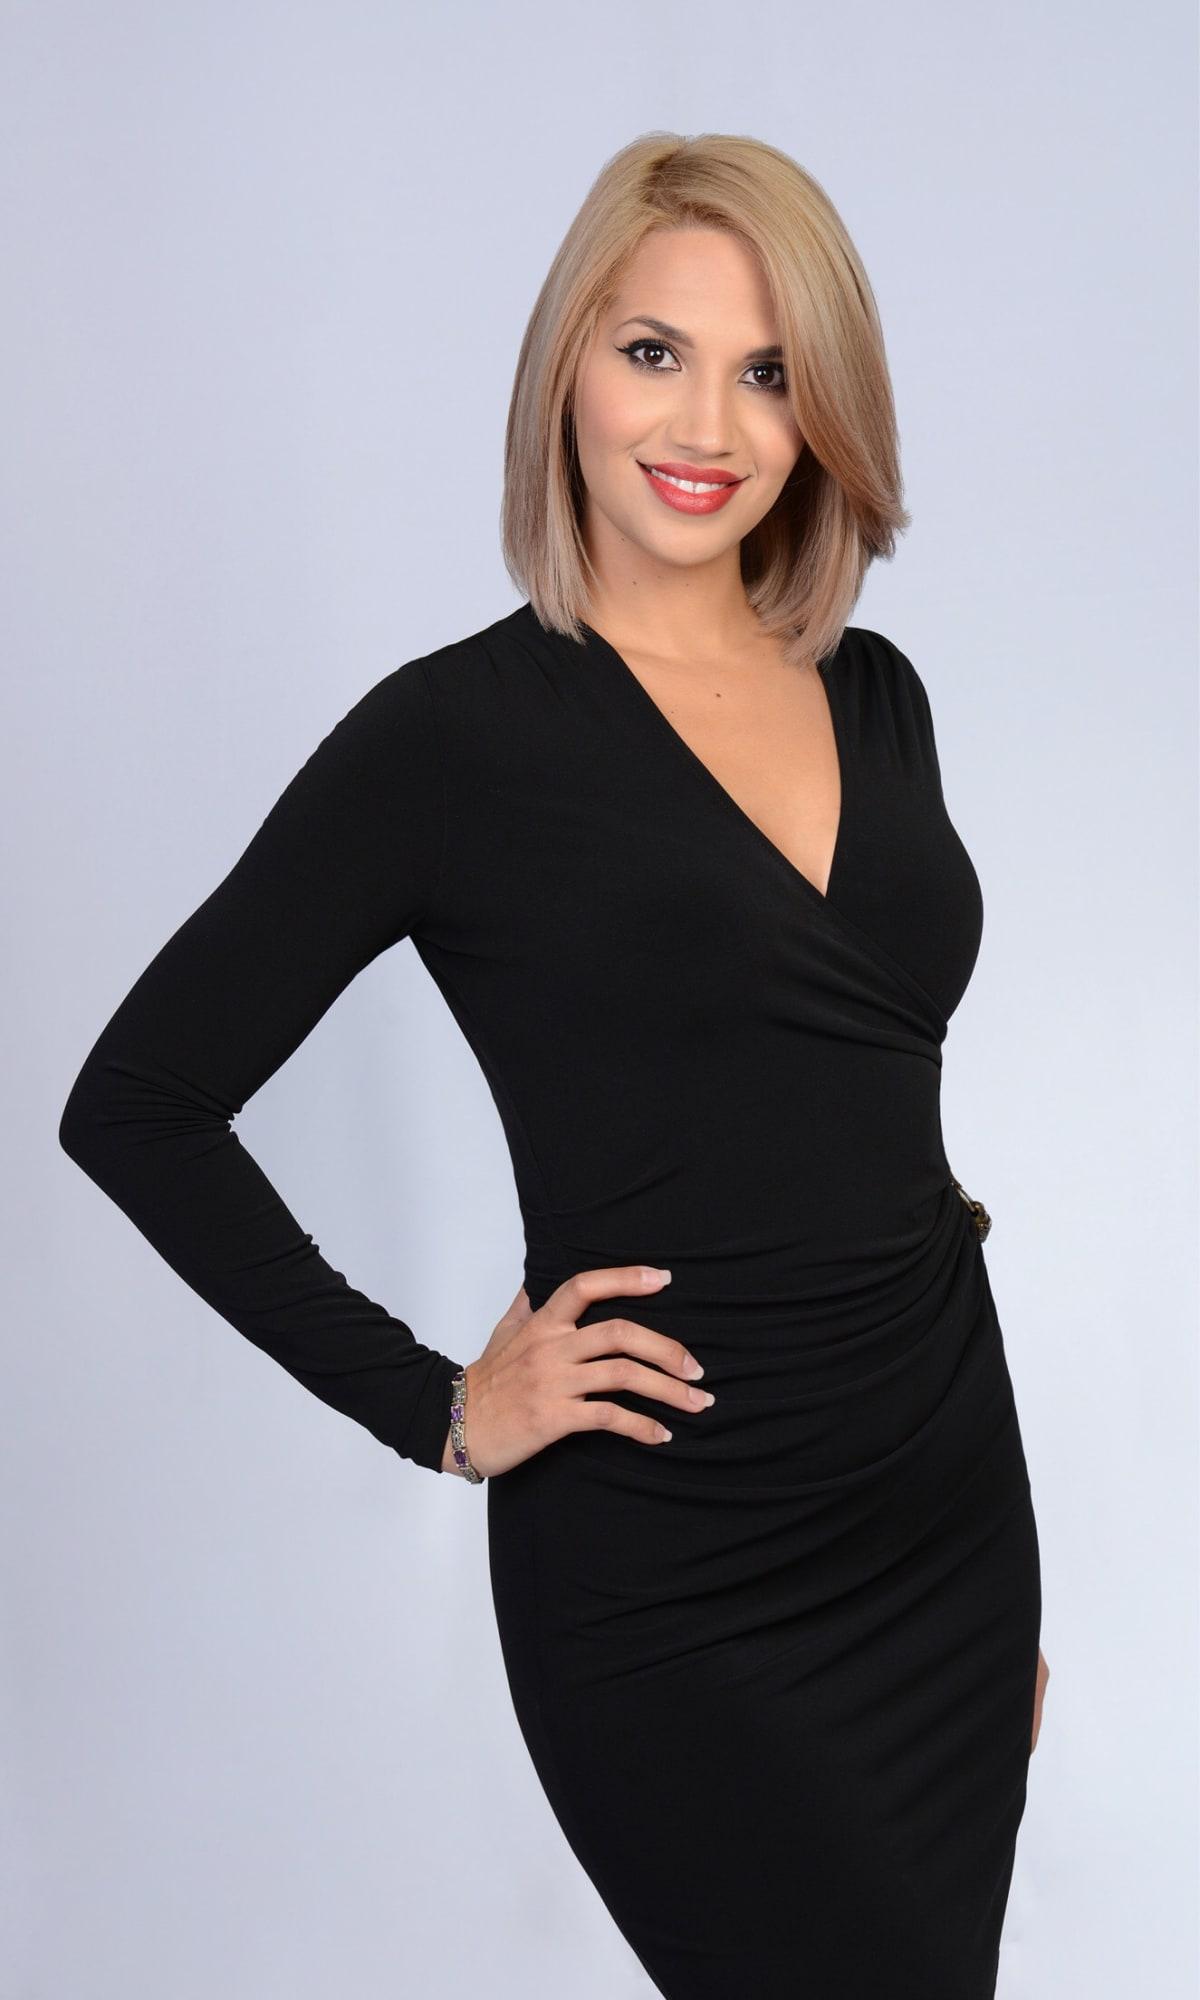 Soccer,Arlene Howell Adult clips Olivia Grant (actress, born 1983),Keiko Agena